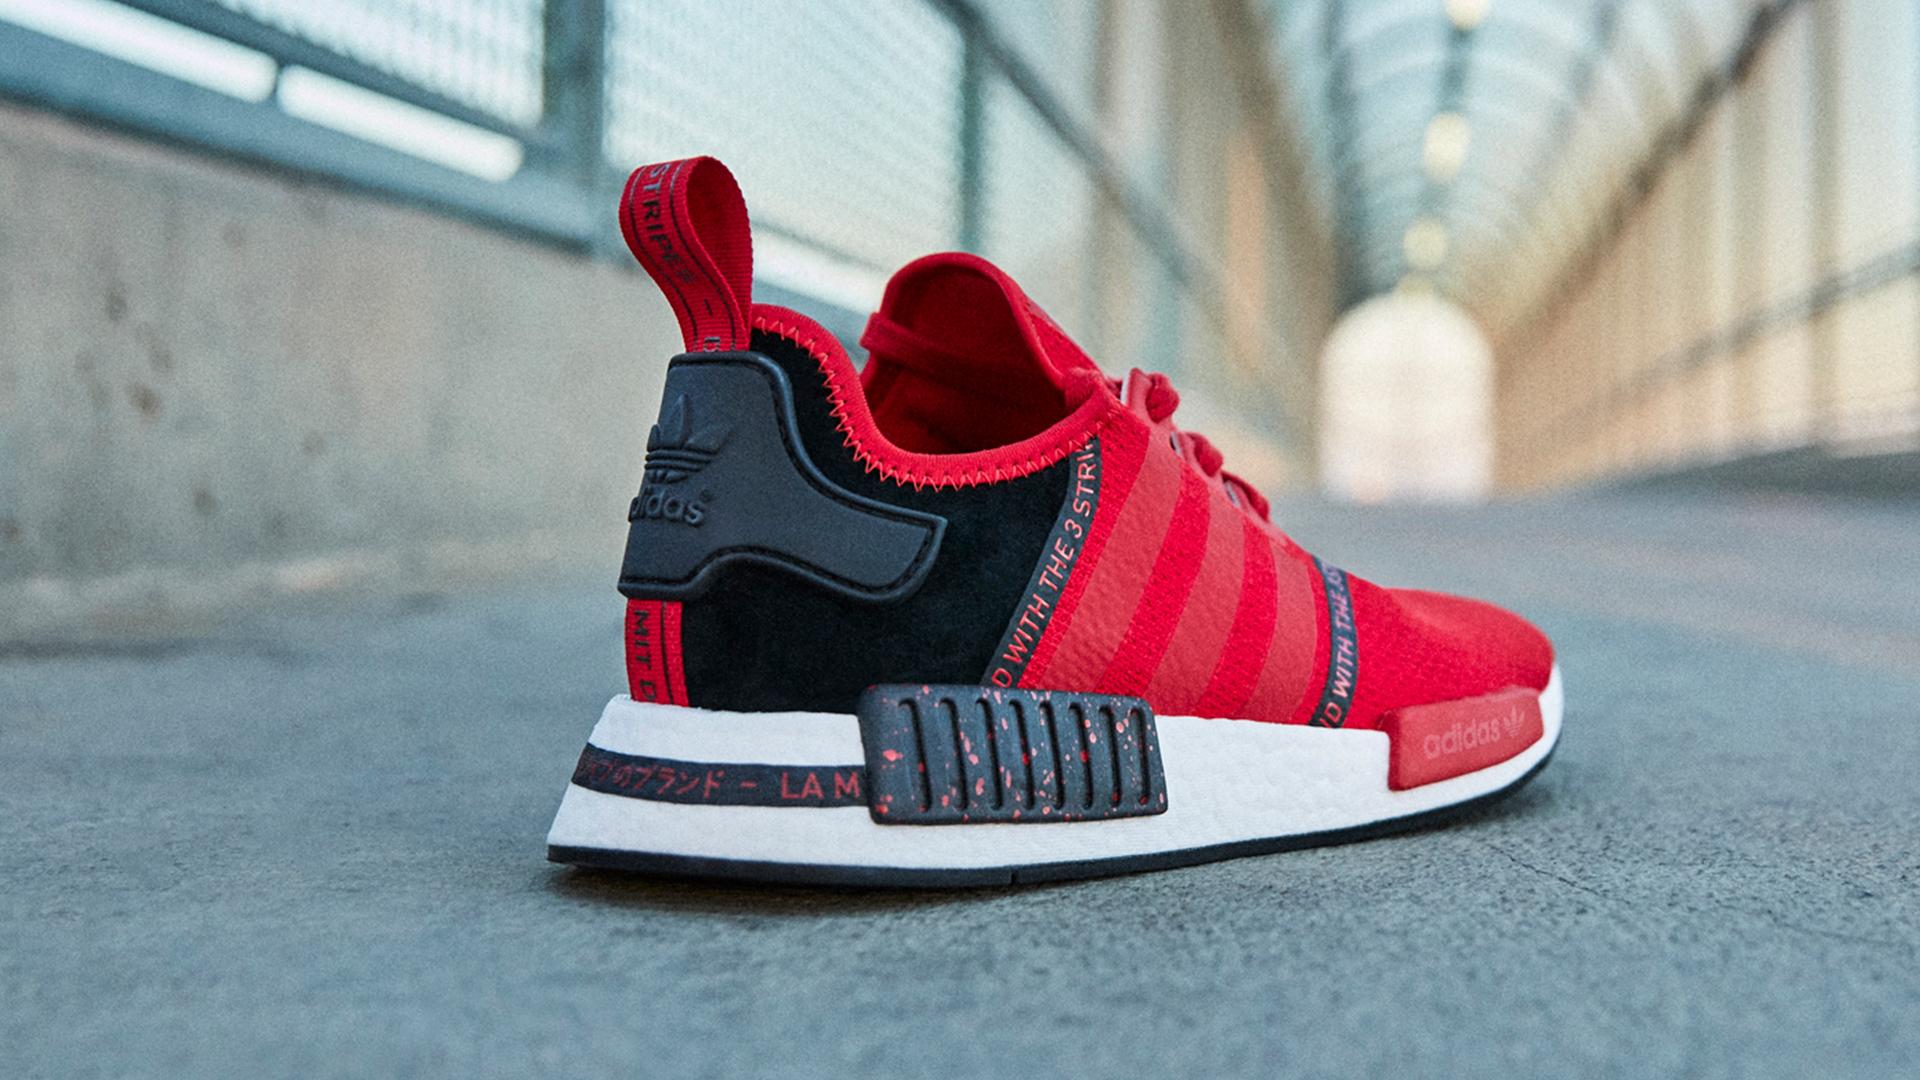 2677804df Foot Locker And adidas Originals Are Releasing The Next Innovation ...